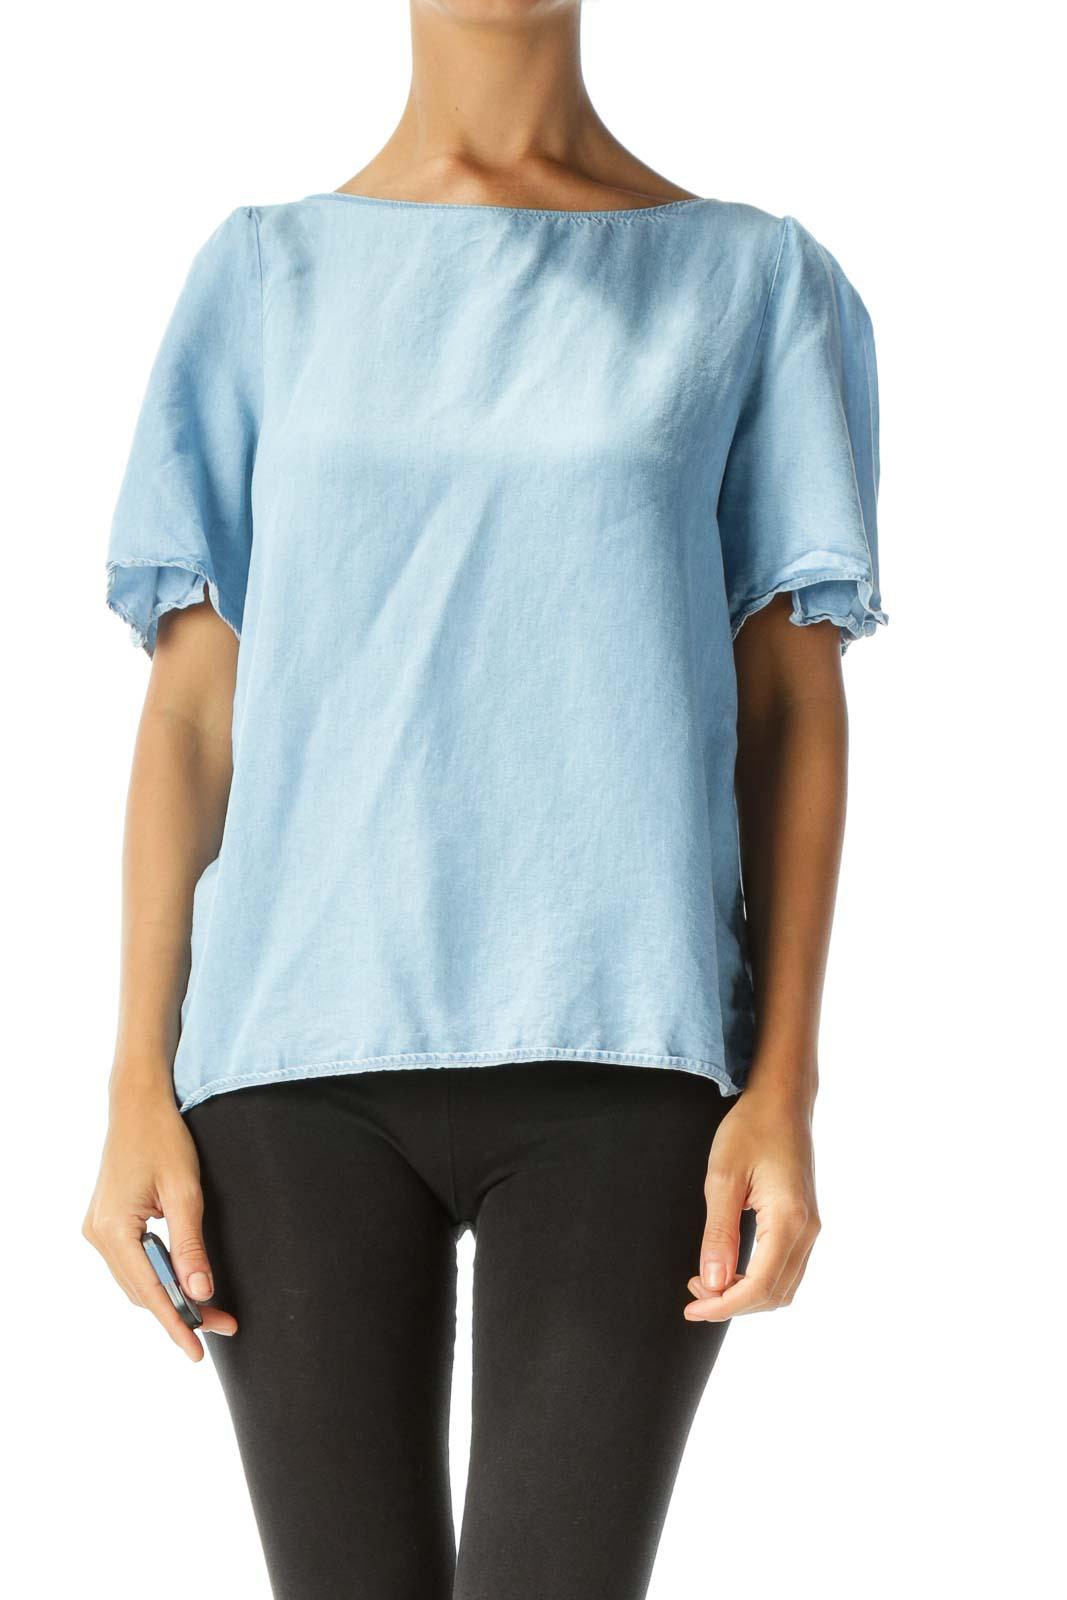 Blue Mock-Denim Slitted-Sleeves Back-Tie Blouse